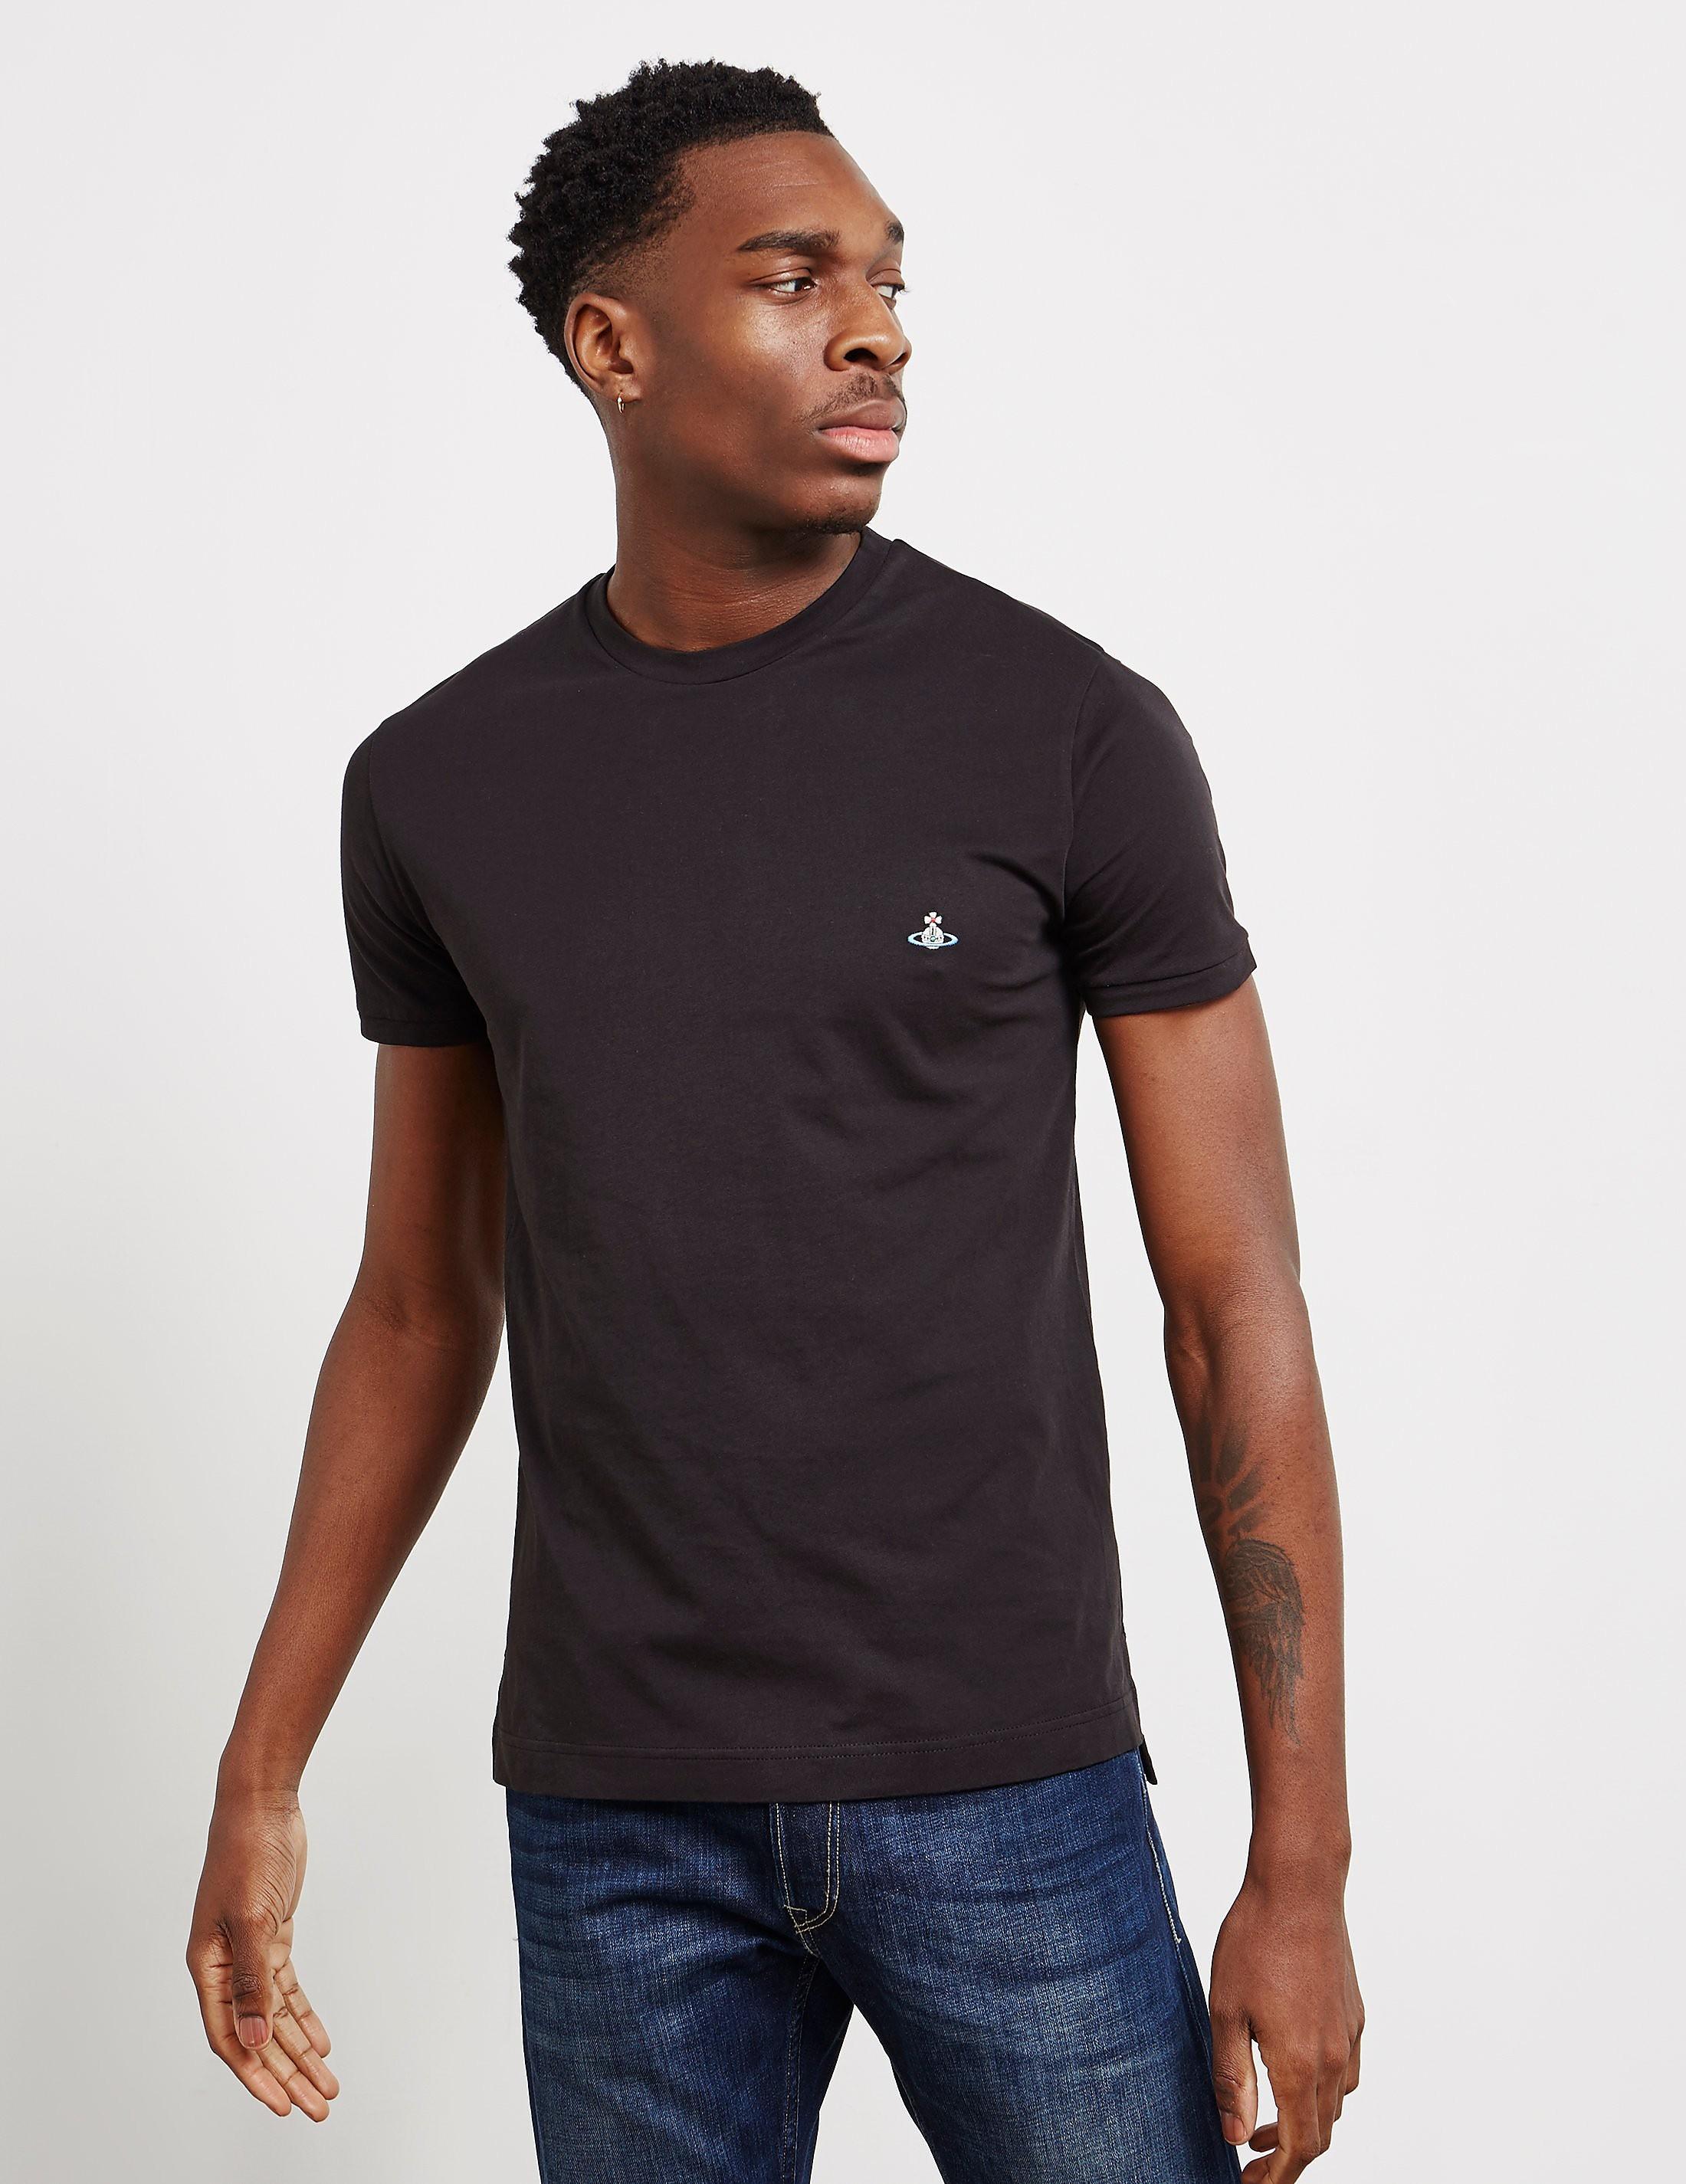 Vivienne Westwood Orb Short Sleeve T-Shirt